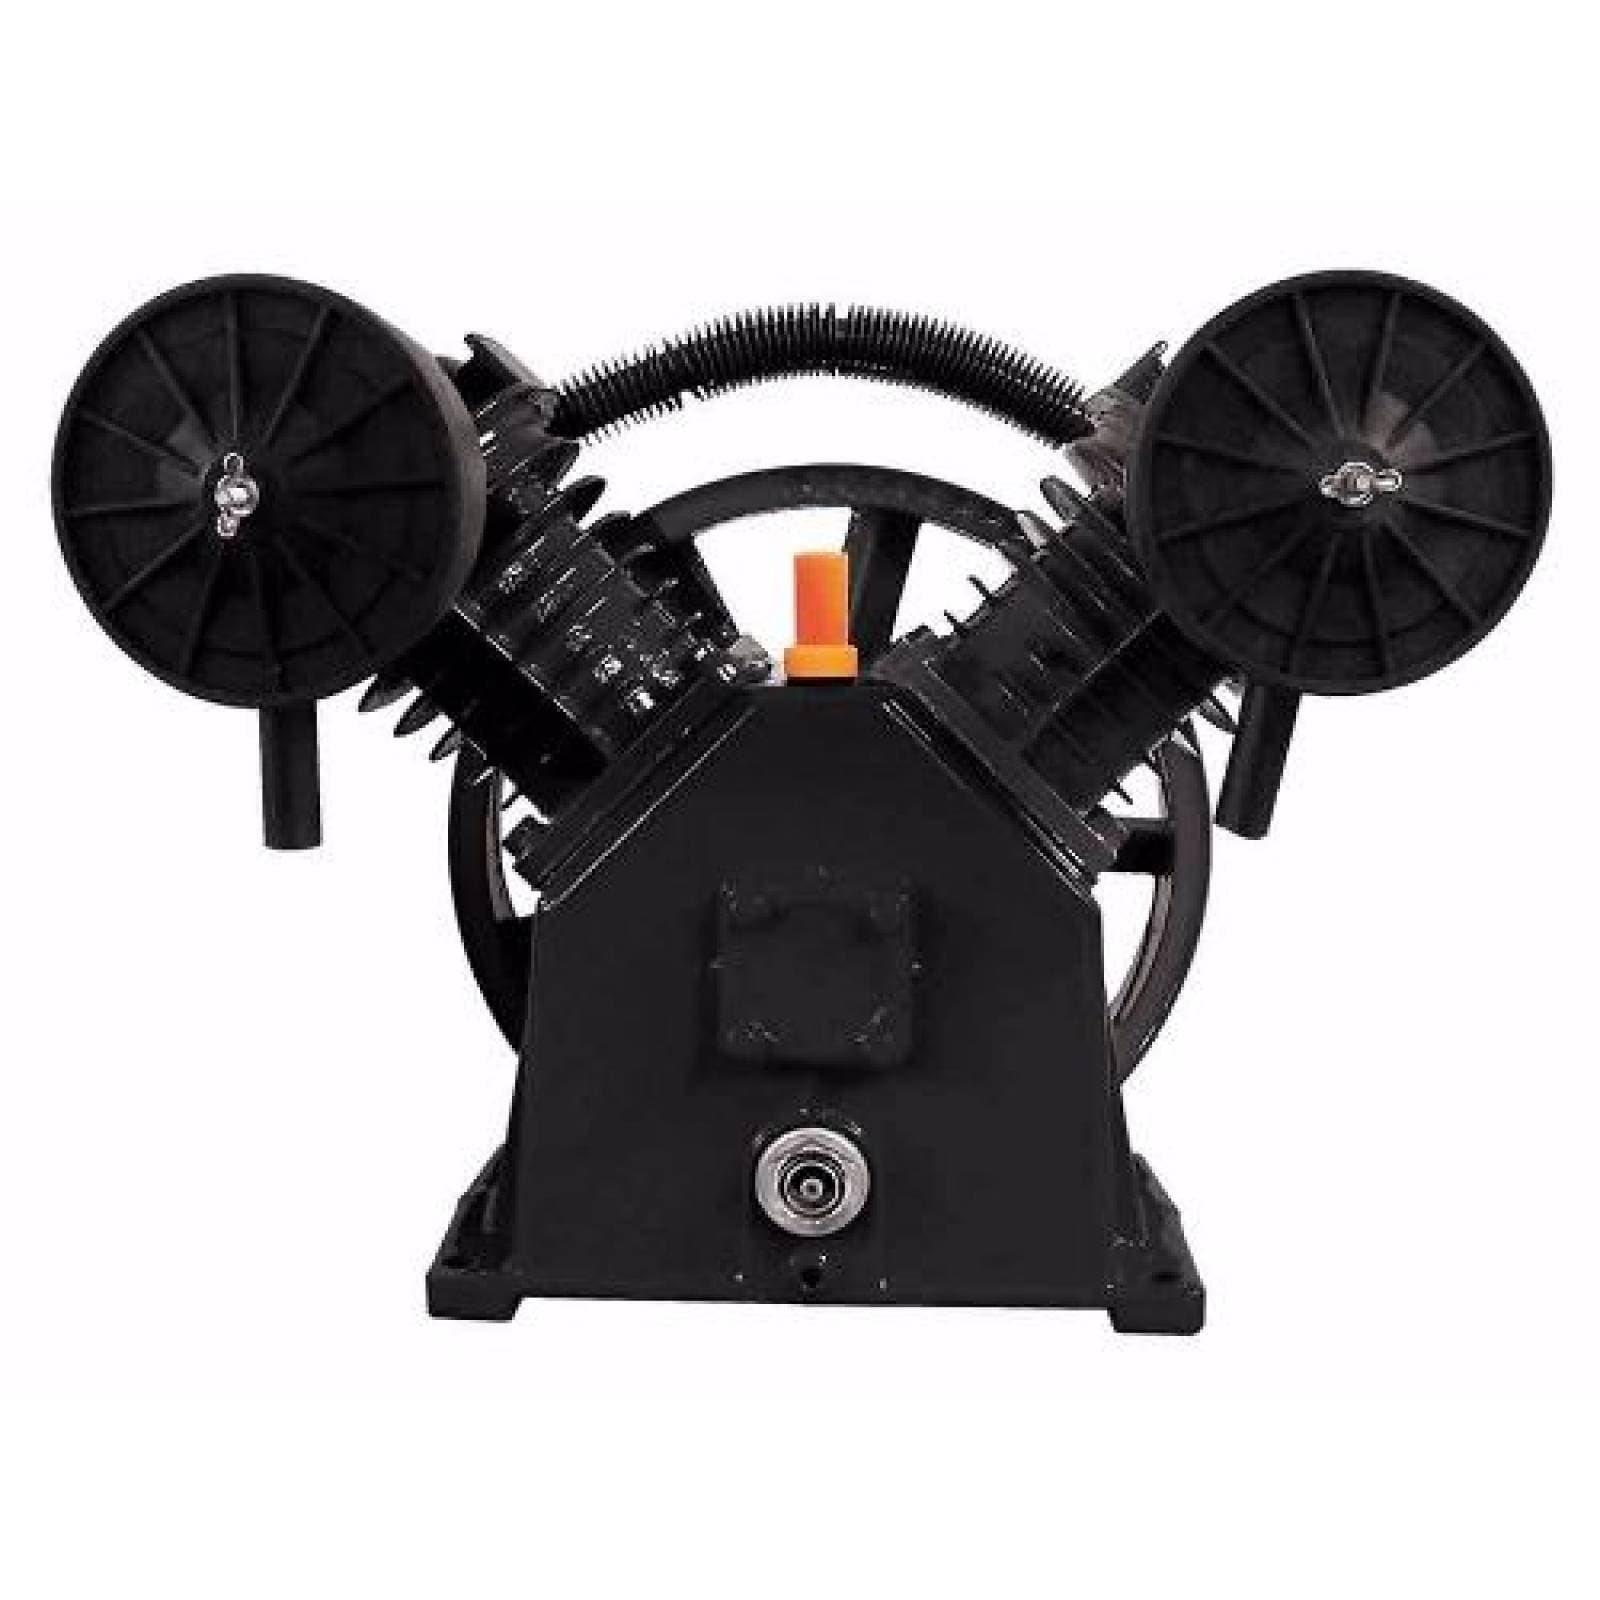 Cabezal Para Compresora 2 Hp Motor Potente Mikels